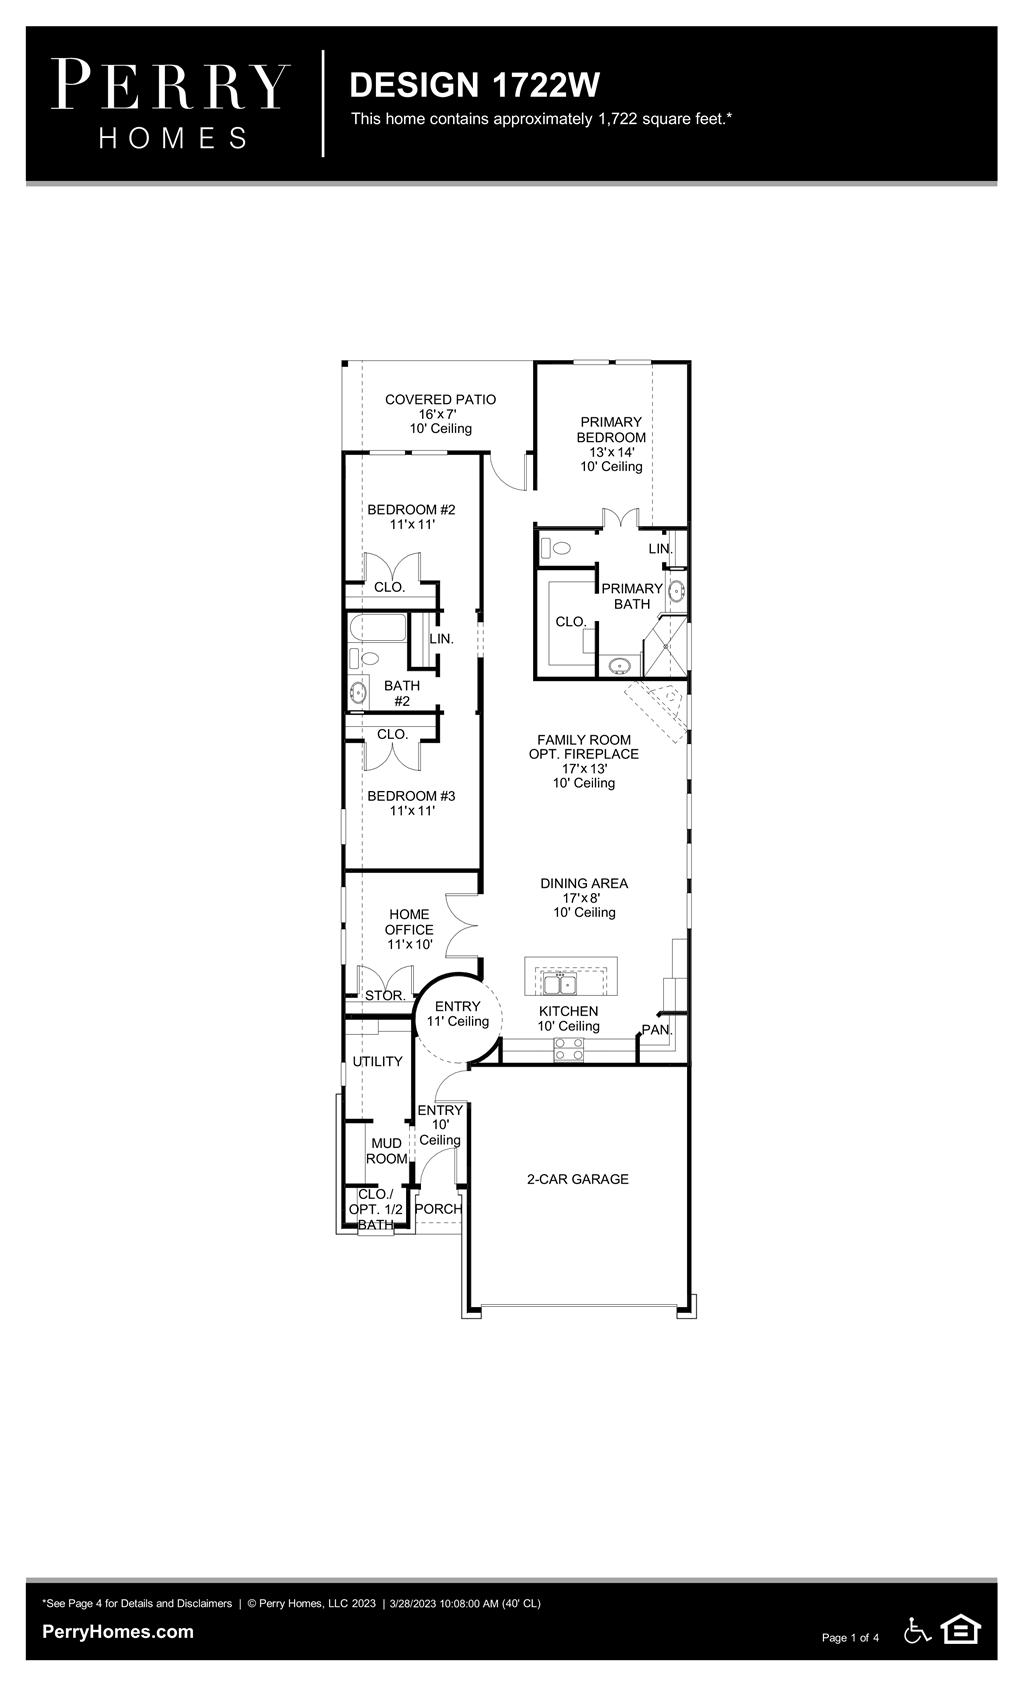 Floor Plan for 1722W